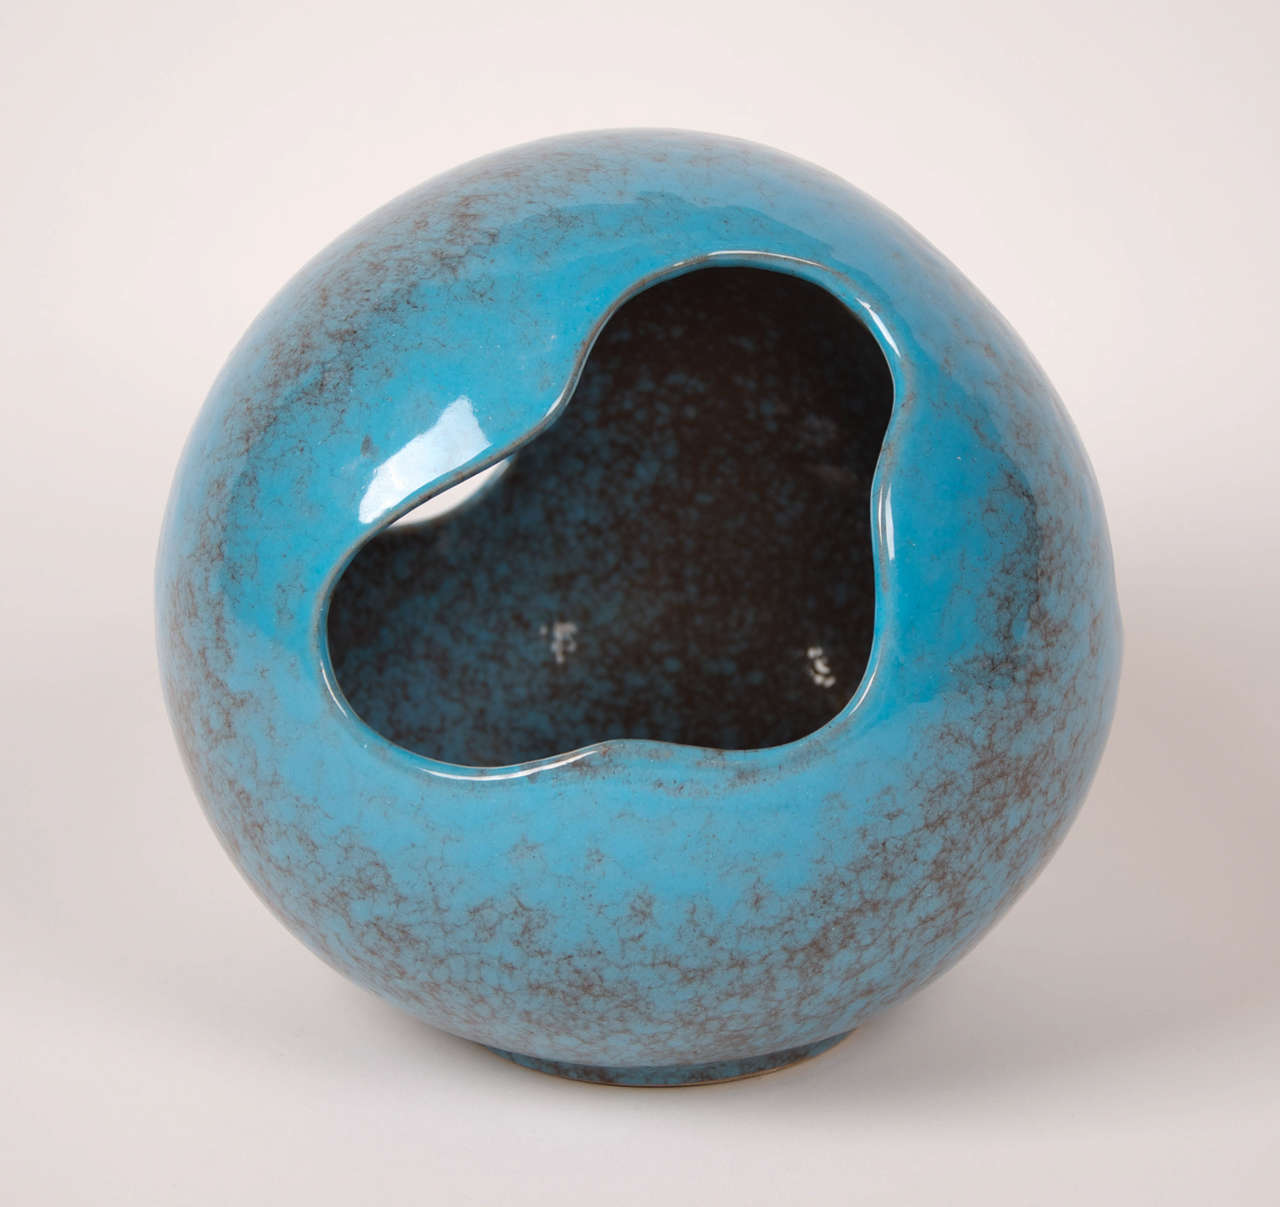 1950 Italian pottery sculpture by Antonia Campi 5